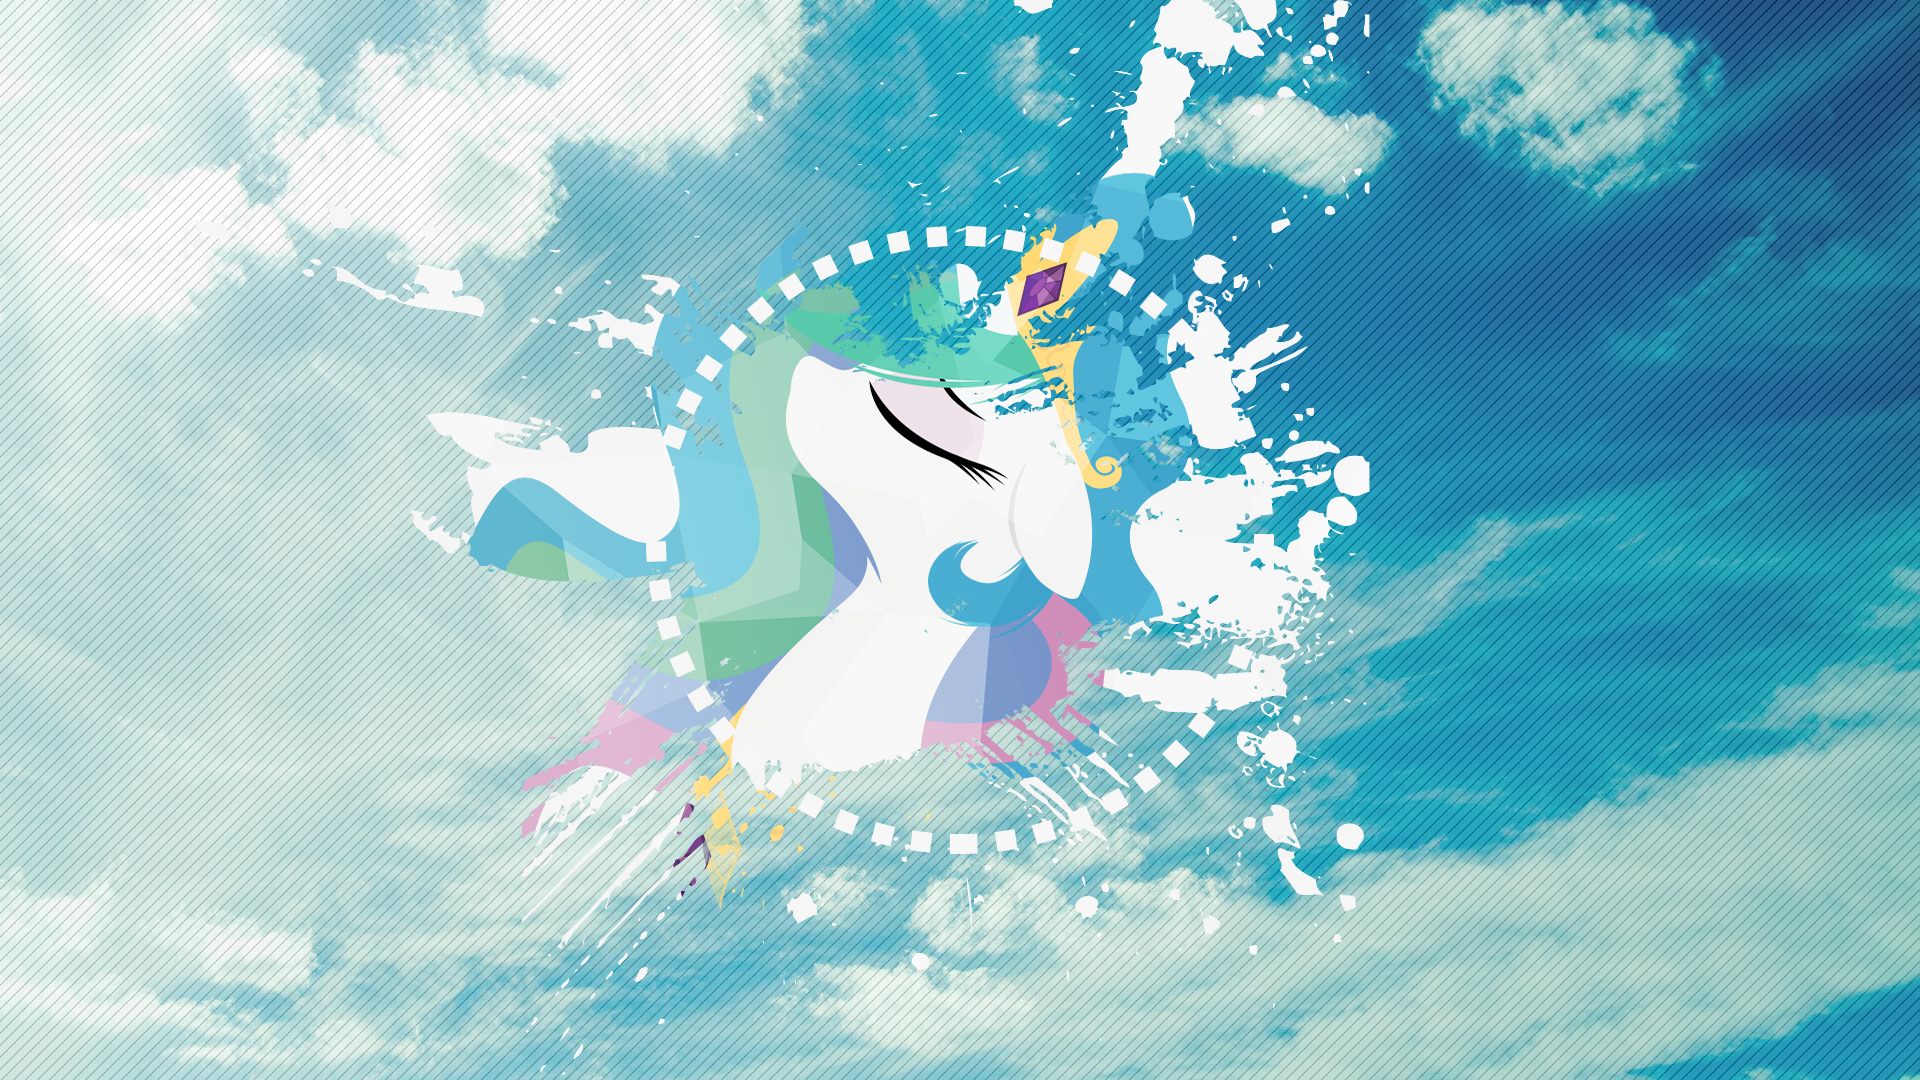 Celestia's dreams